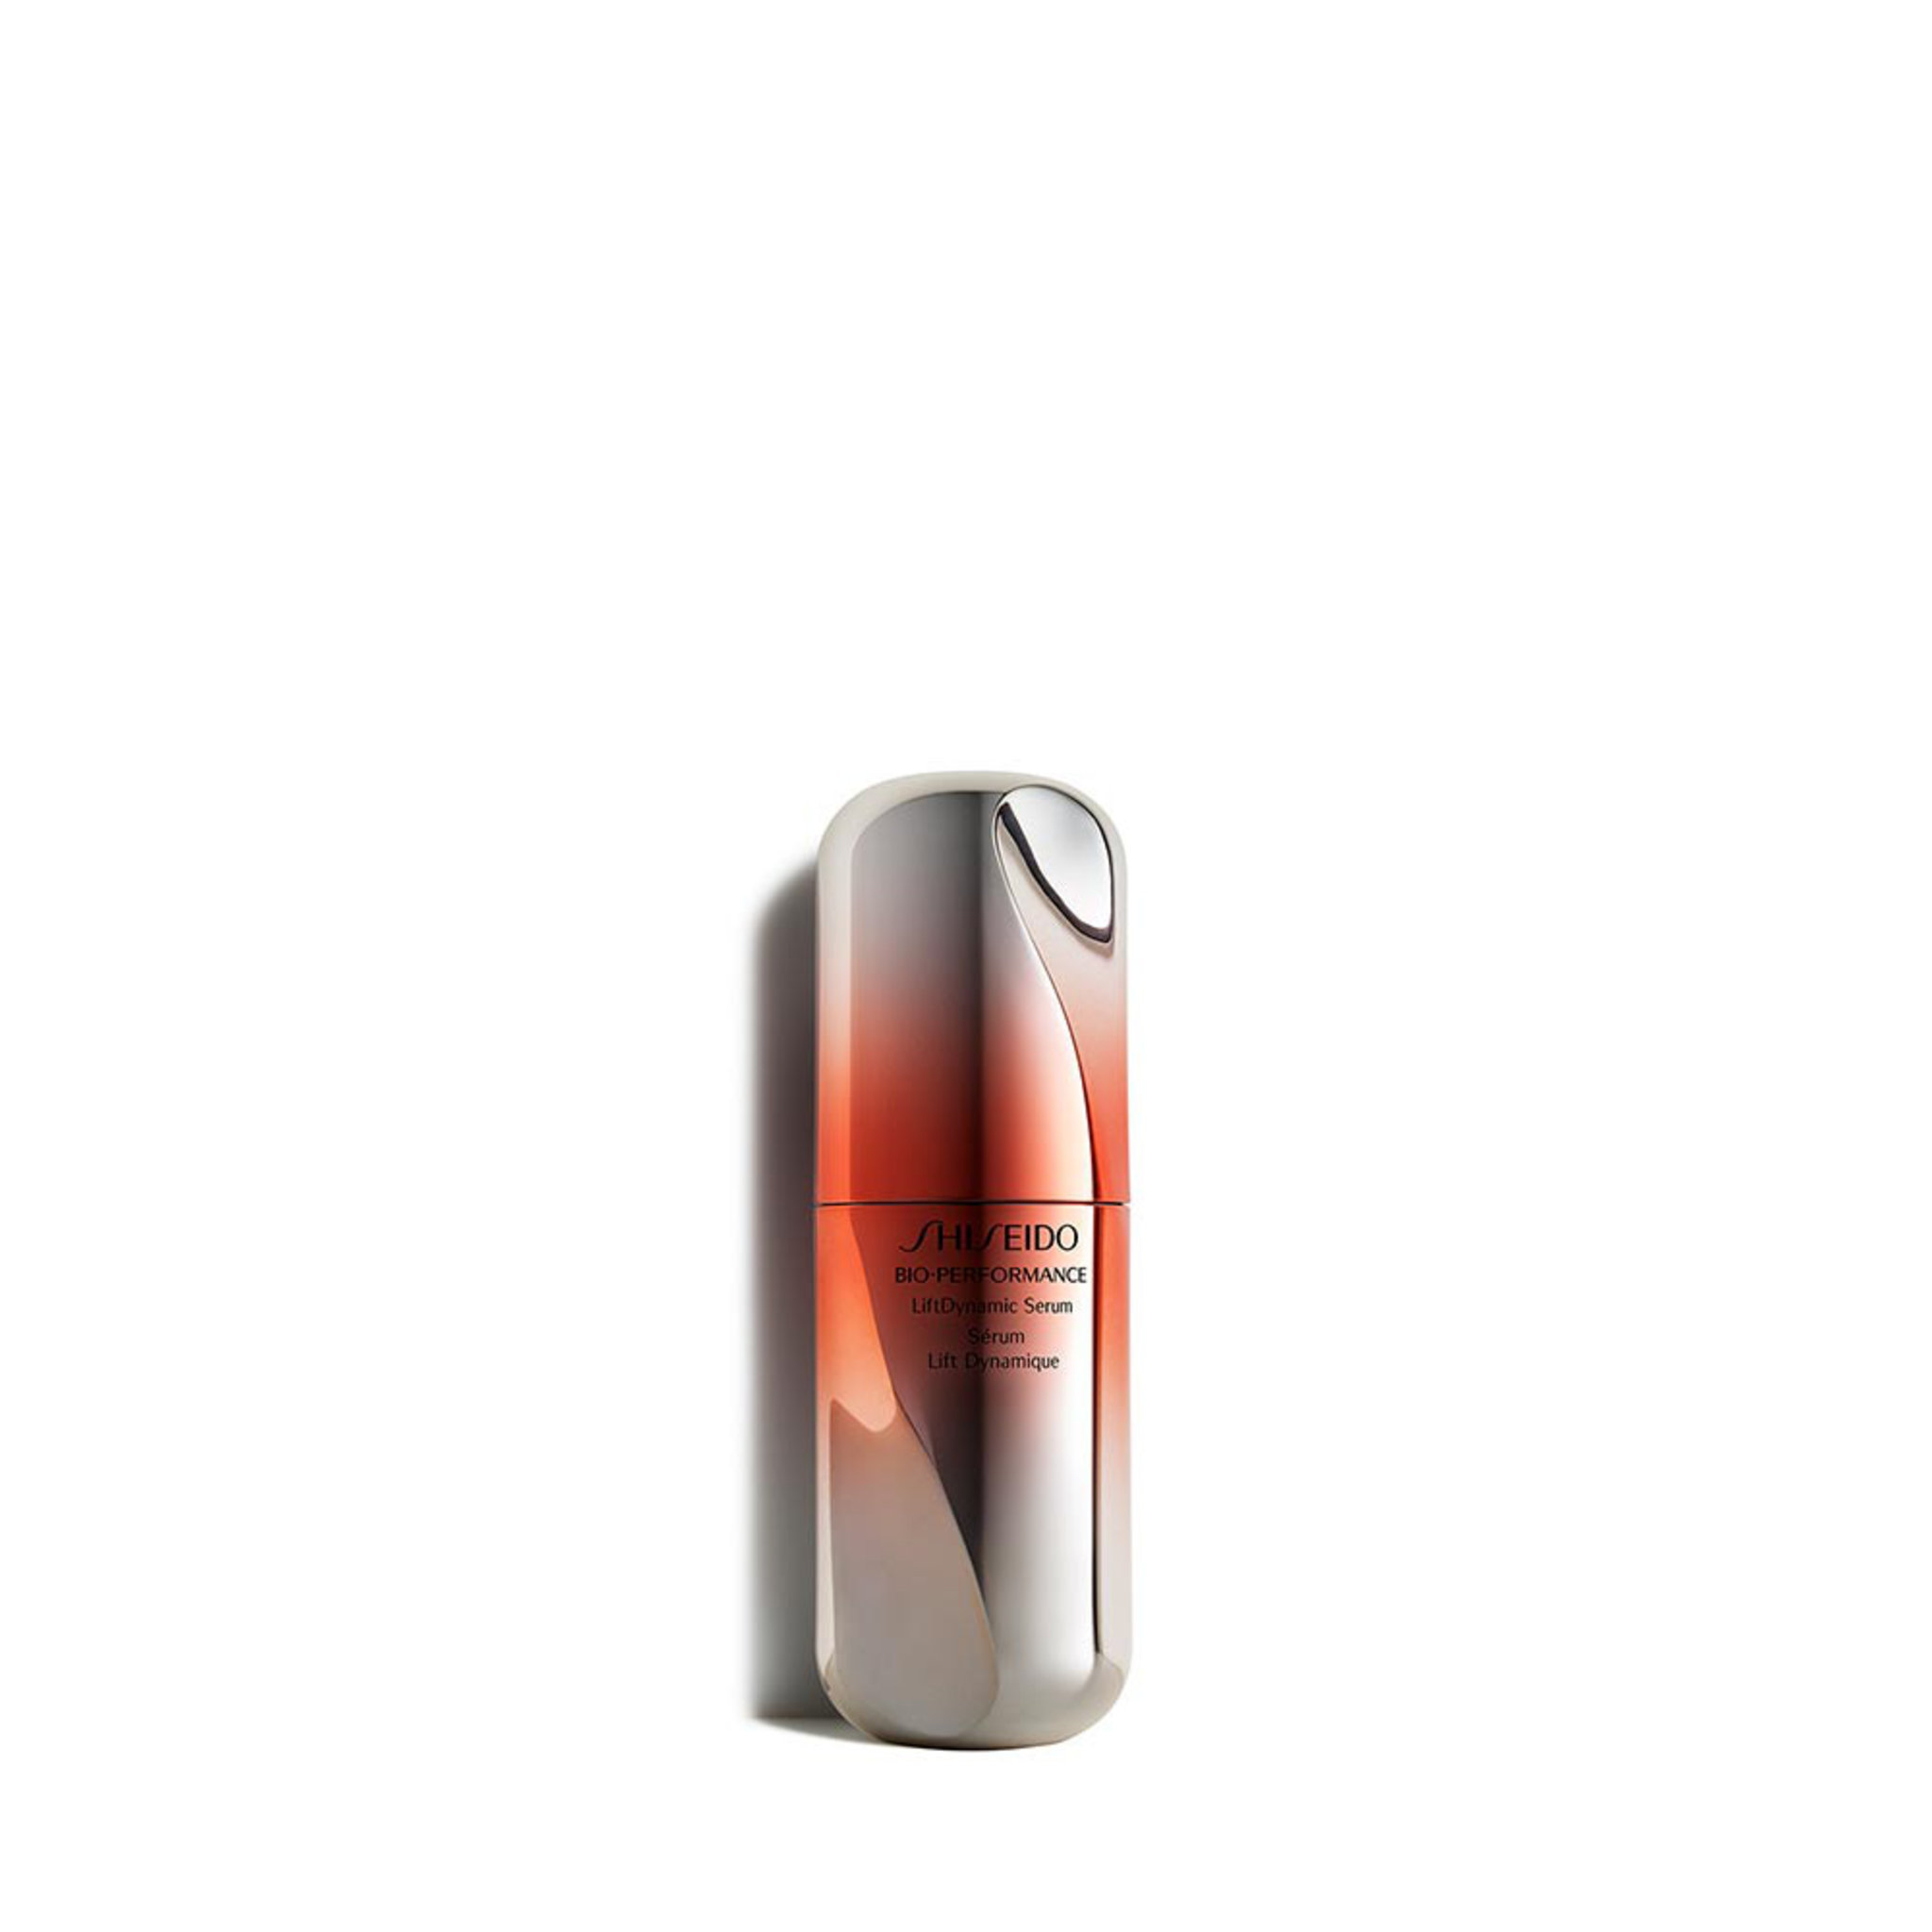 Bio-Performance Lift Dynamic Serum, 30 ml